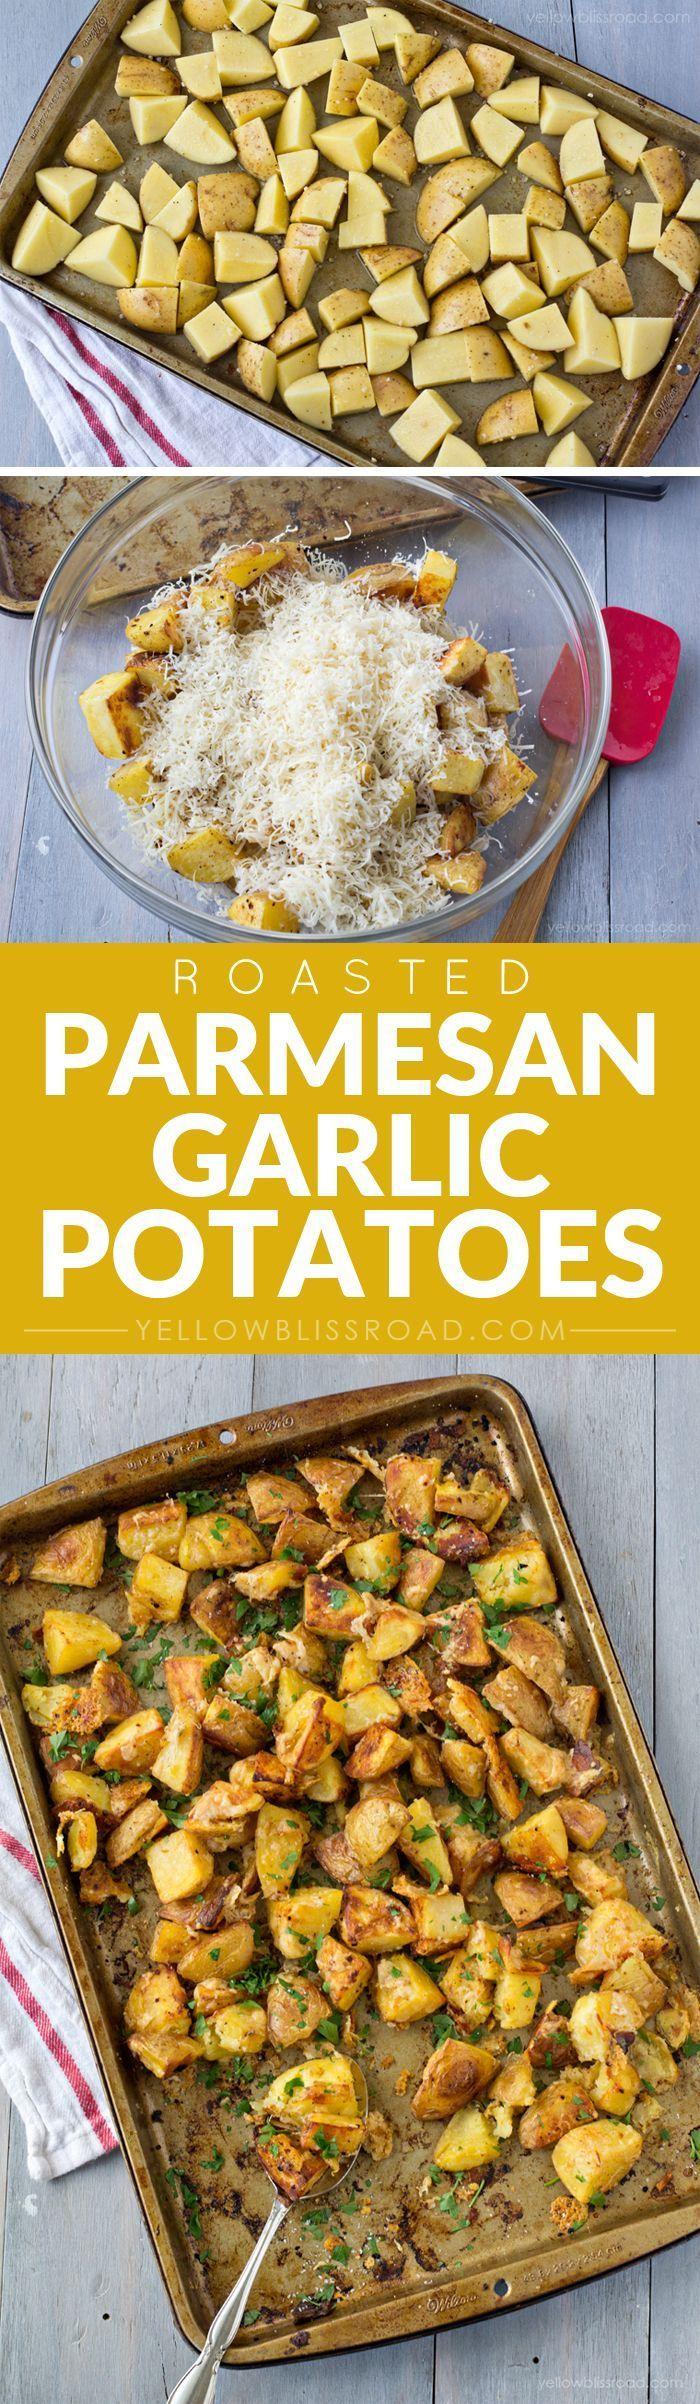 Oven Roasted Parmesan Garlic Potatoes | Recipe | Potatoes ...